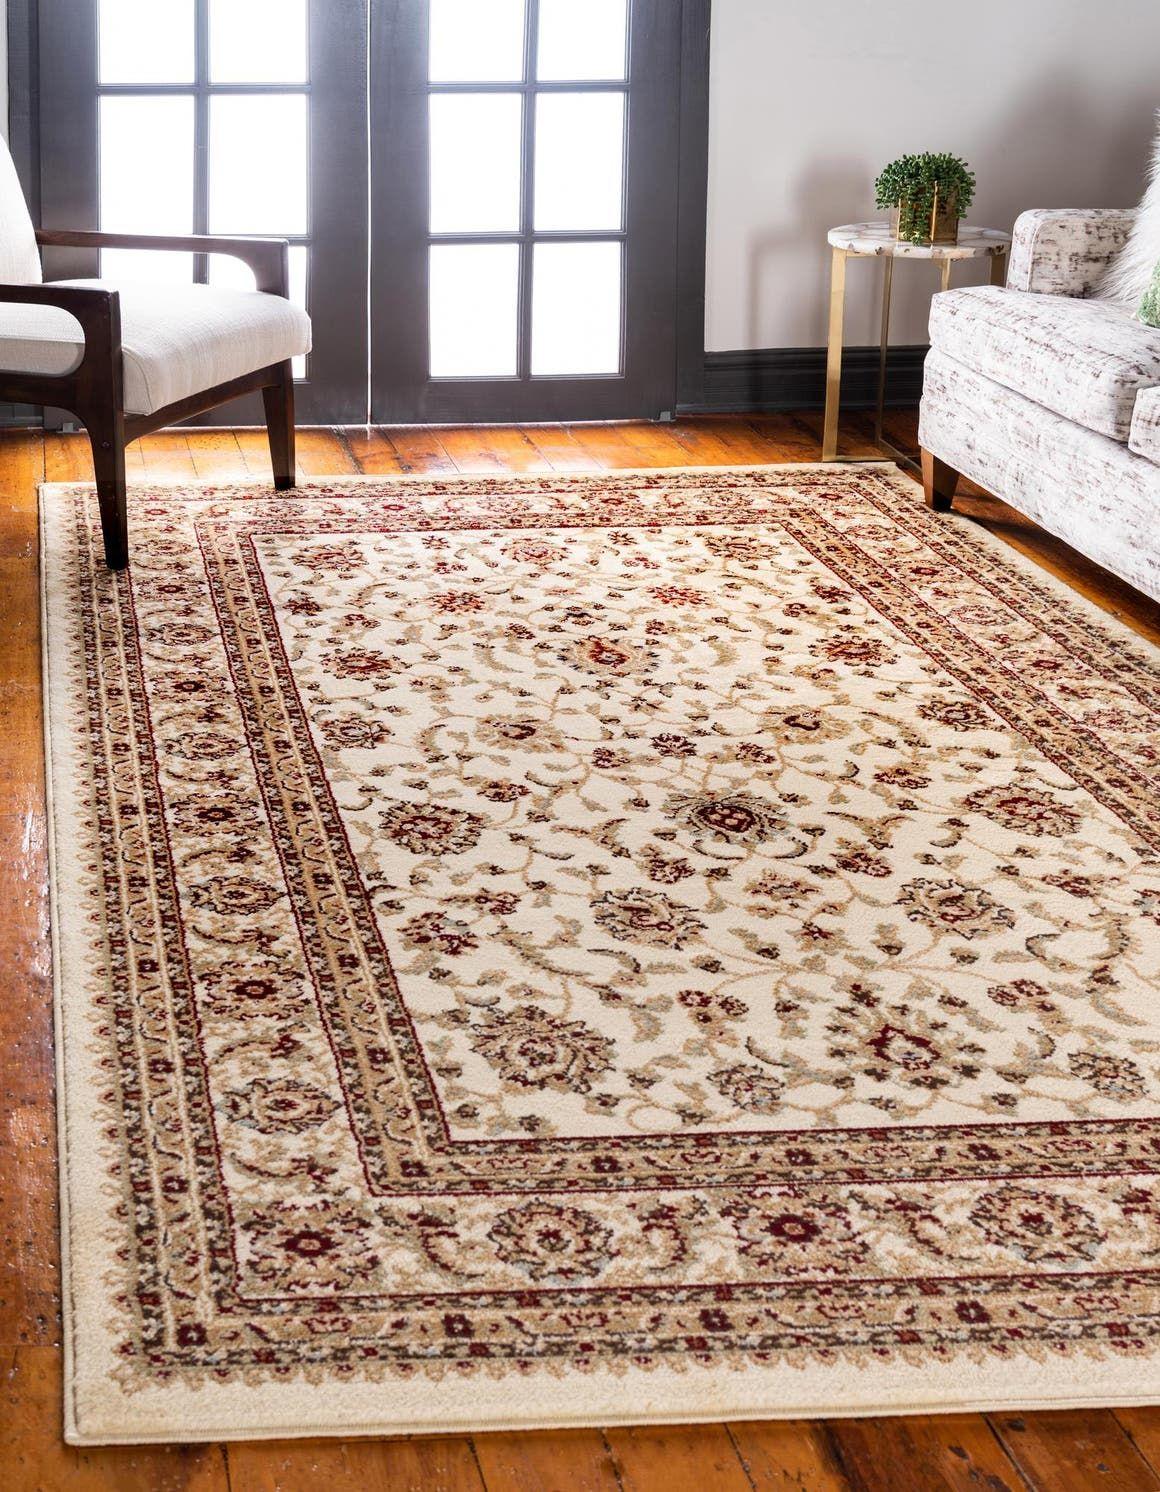 Aditi Cream 5x8 Area Rug In 2021 Agra Rug Rugs Large Area Rugs Large area rug for sale